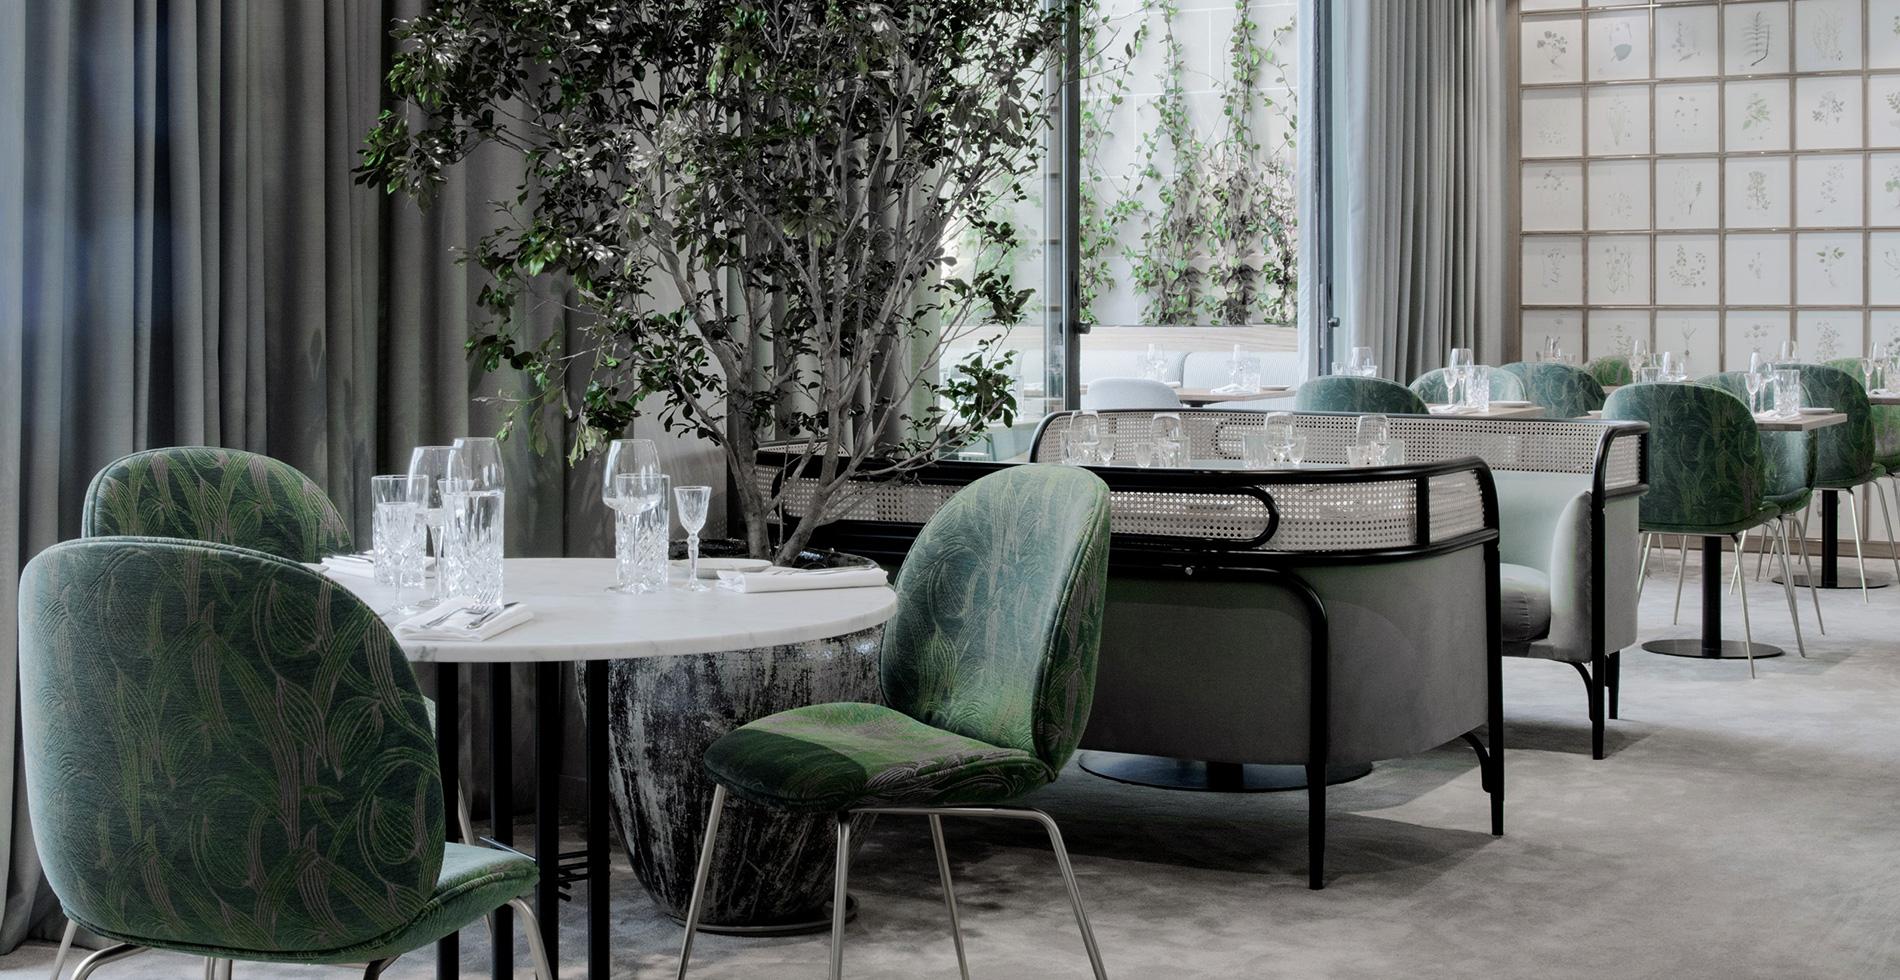 flora danica design blog